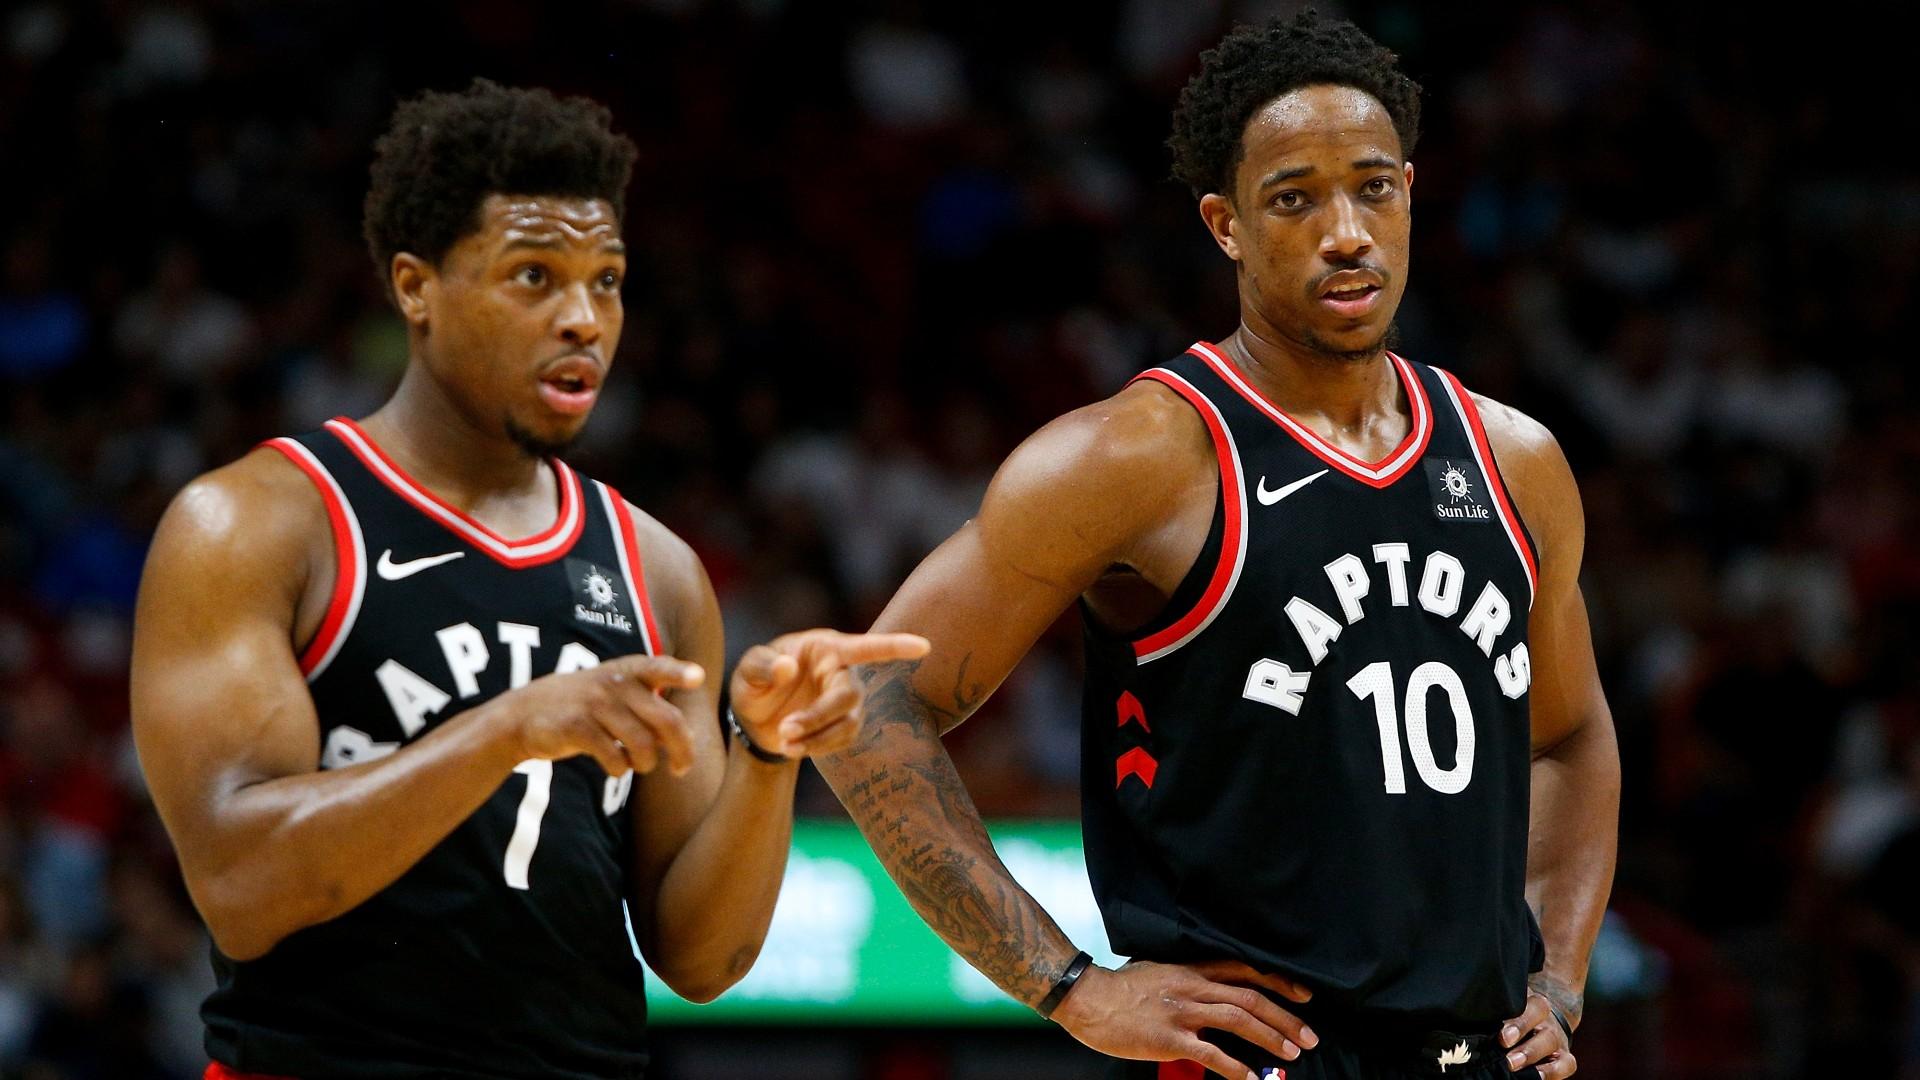 Heat free agency rumors: Miami seeks to reunite Kyle Lowry and DeMar DeRozan